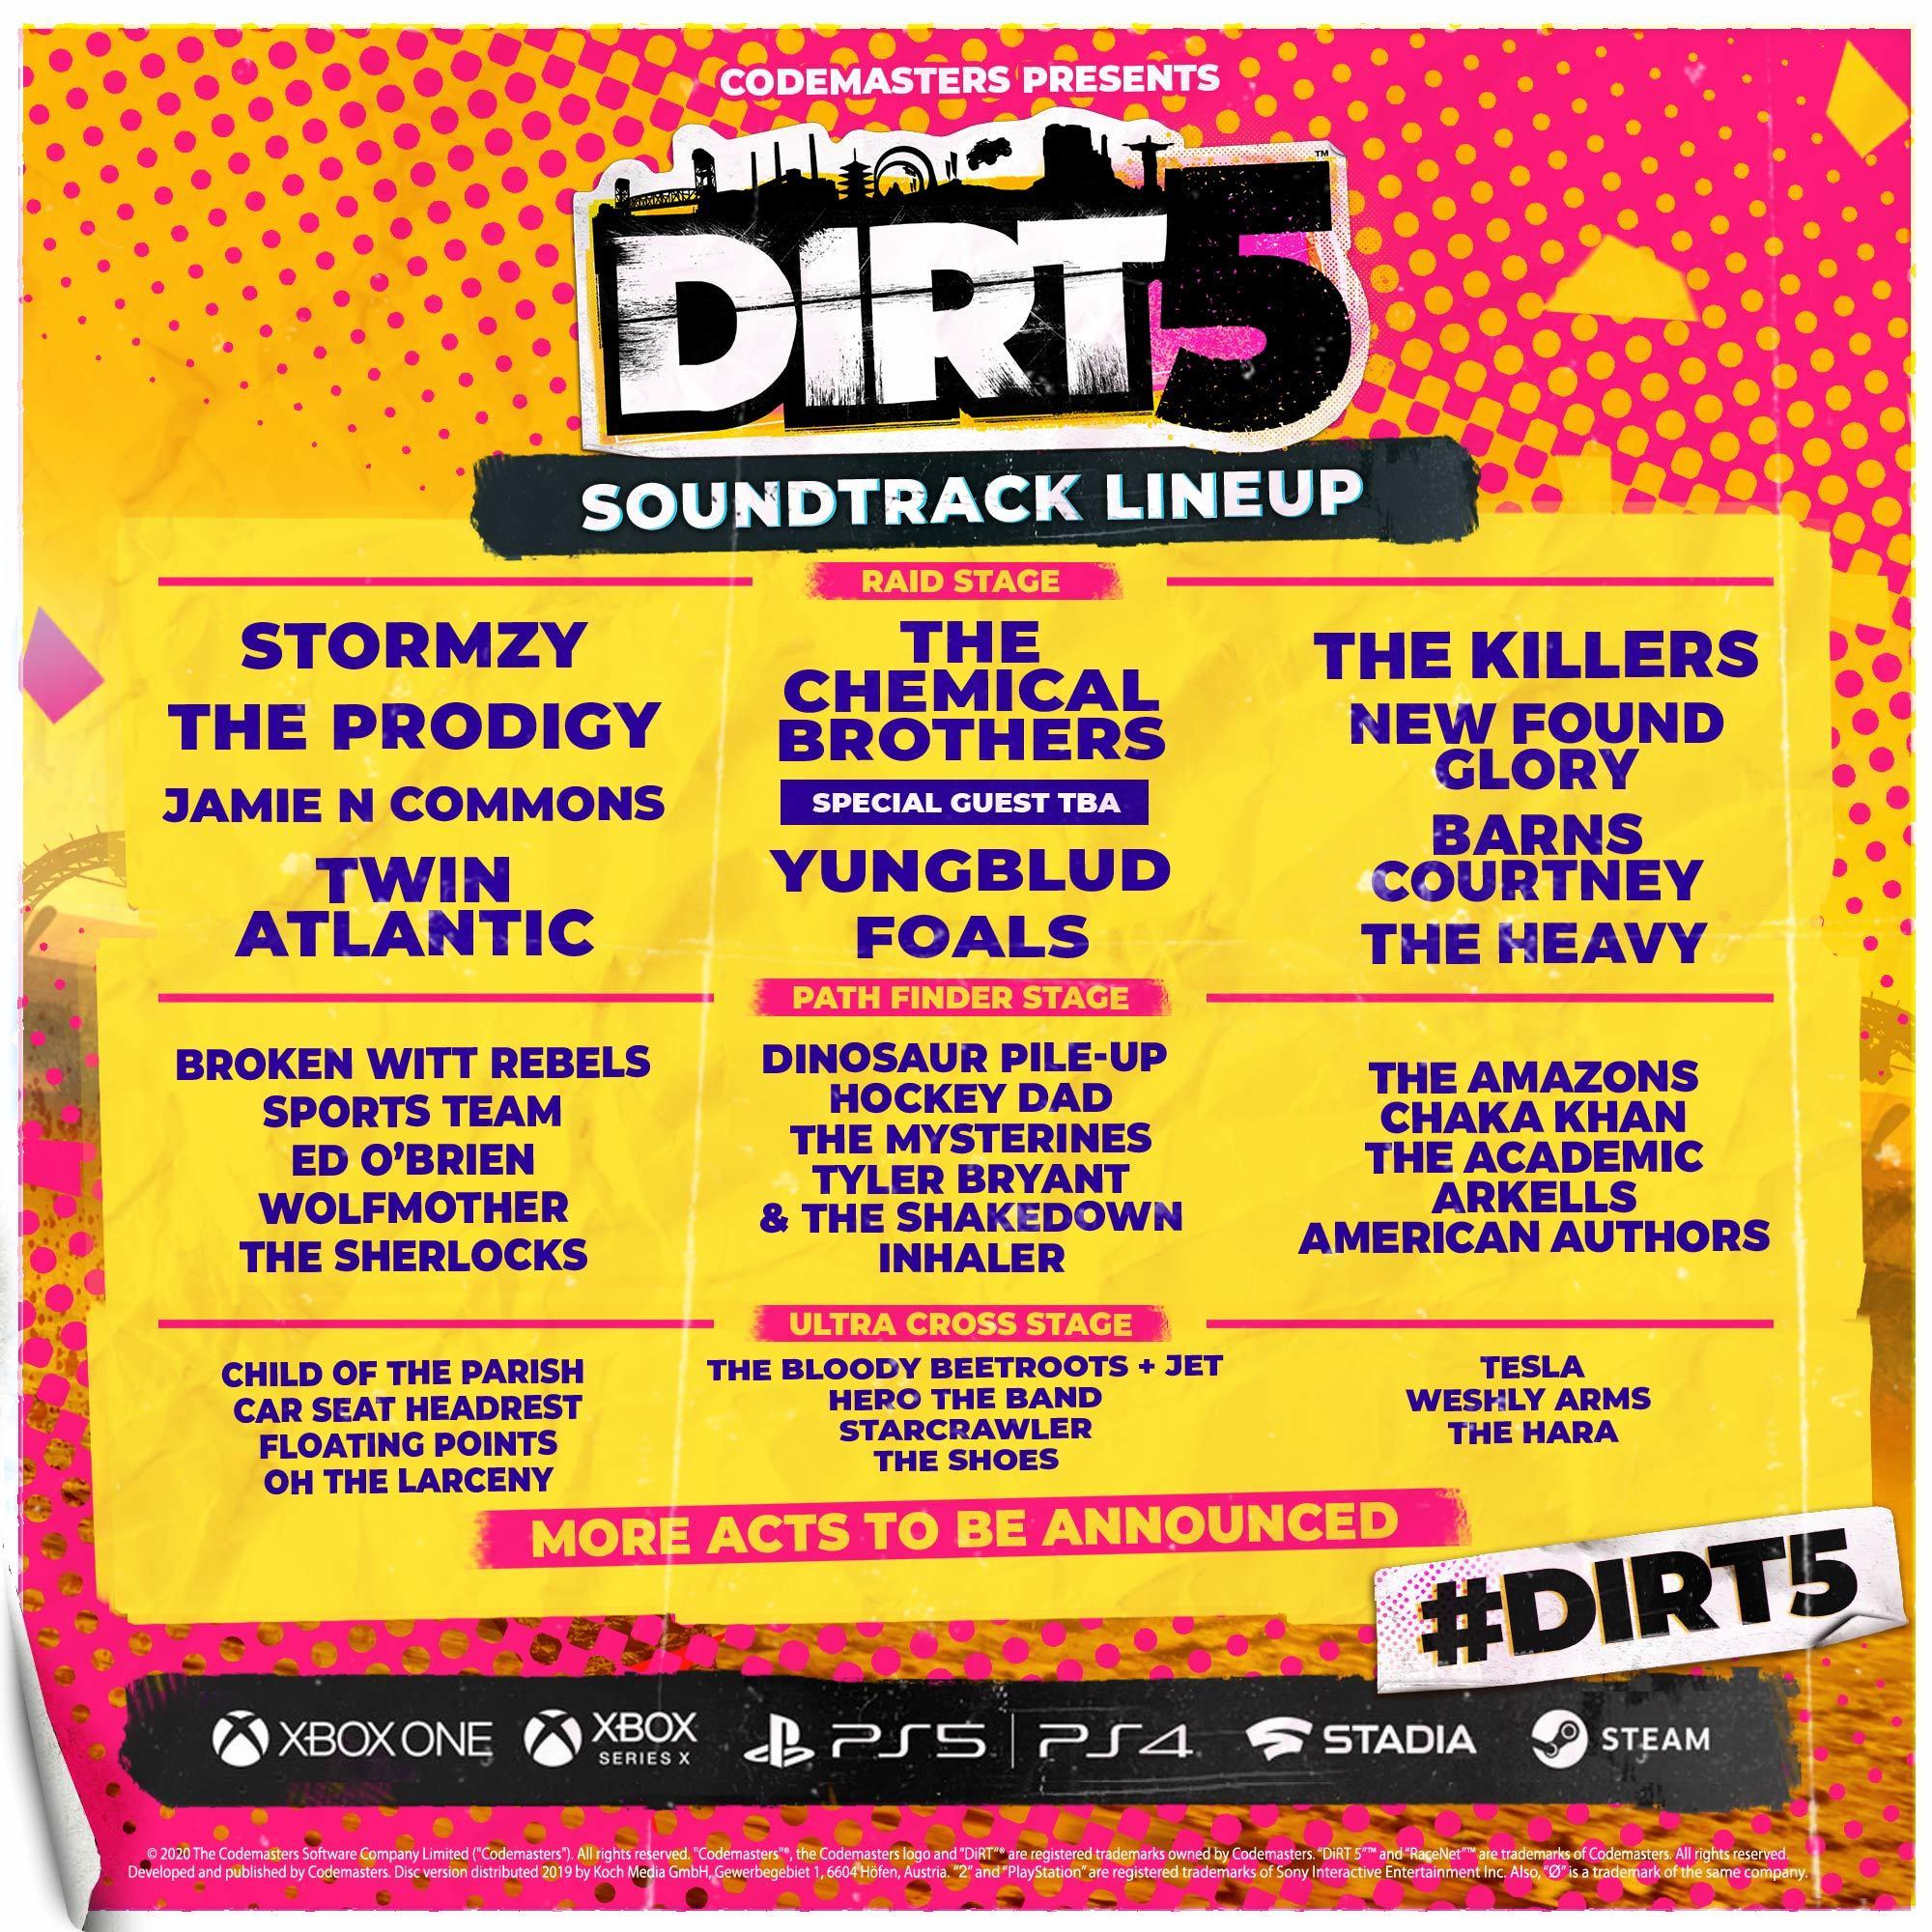 HW požadavky pro DIRT 5 Dirt 5 písně